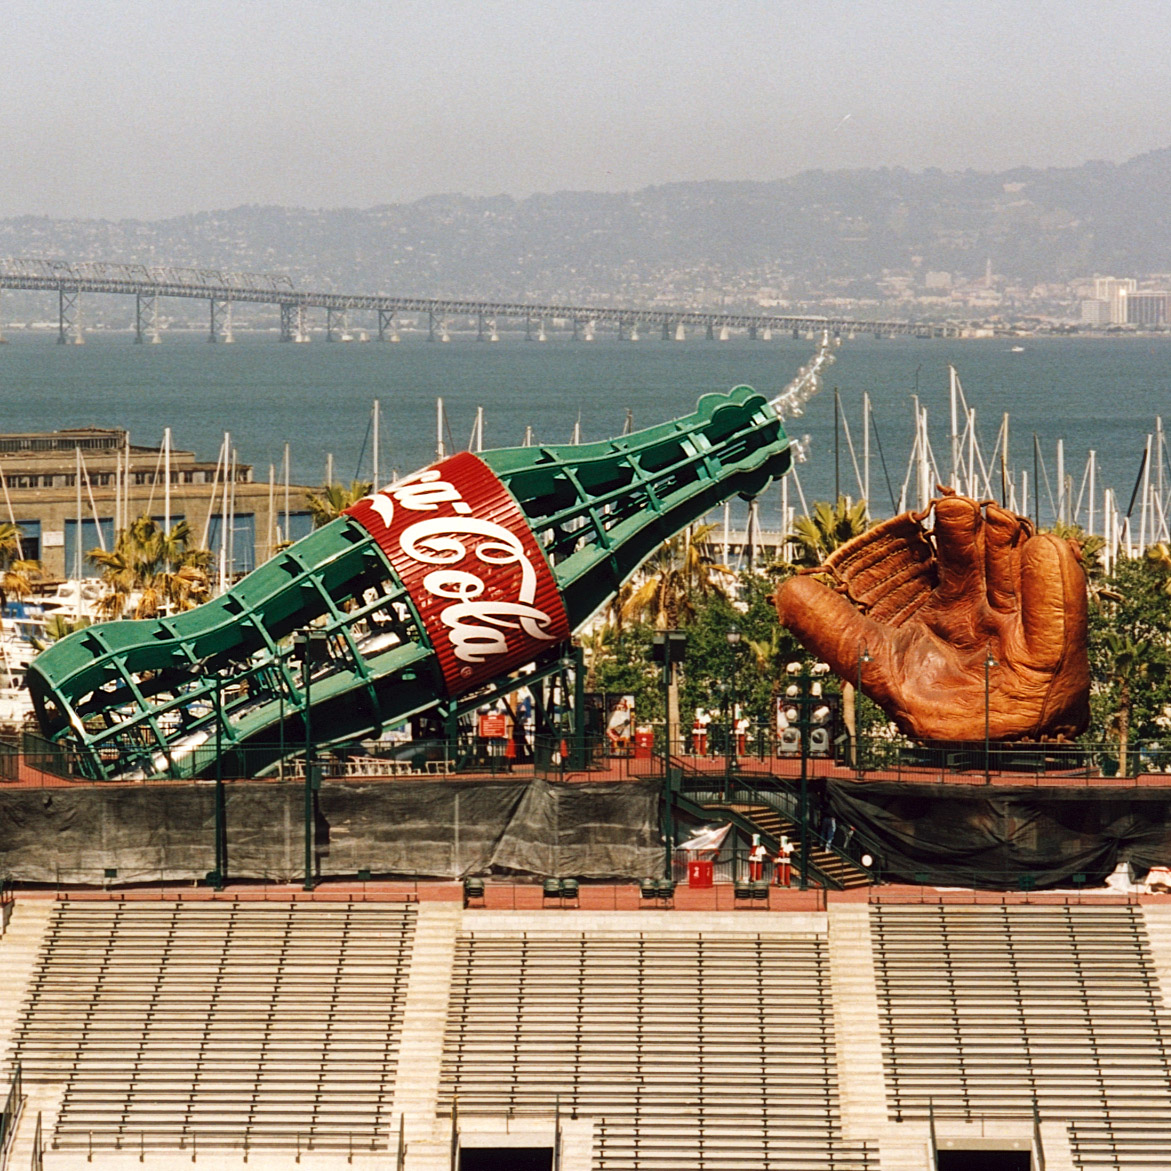 San Francisco Giants Baseball Mitt - Giant Glove Sculpture AT&T Park – Design and Fabrication